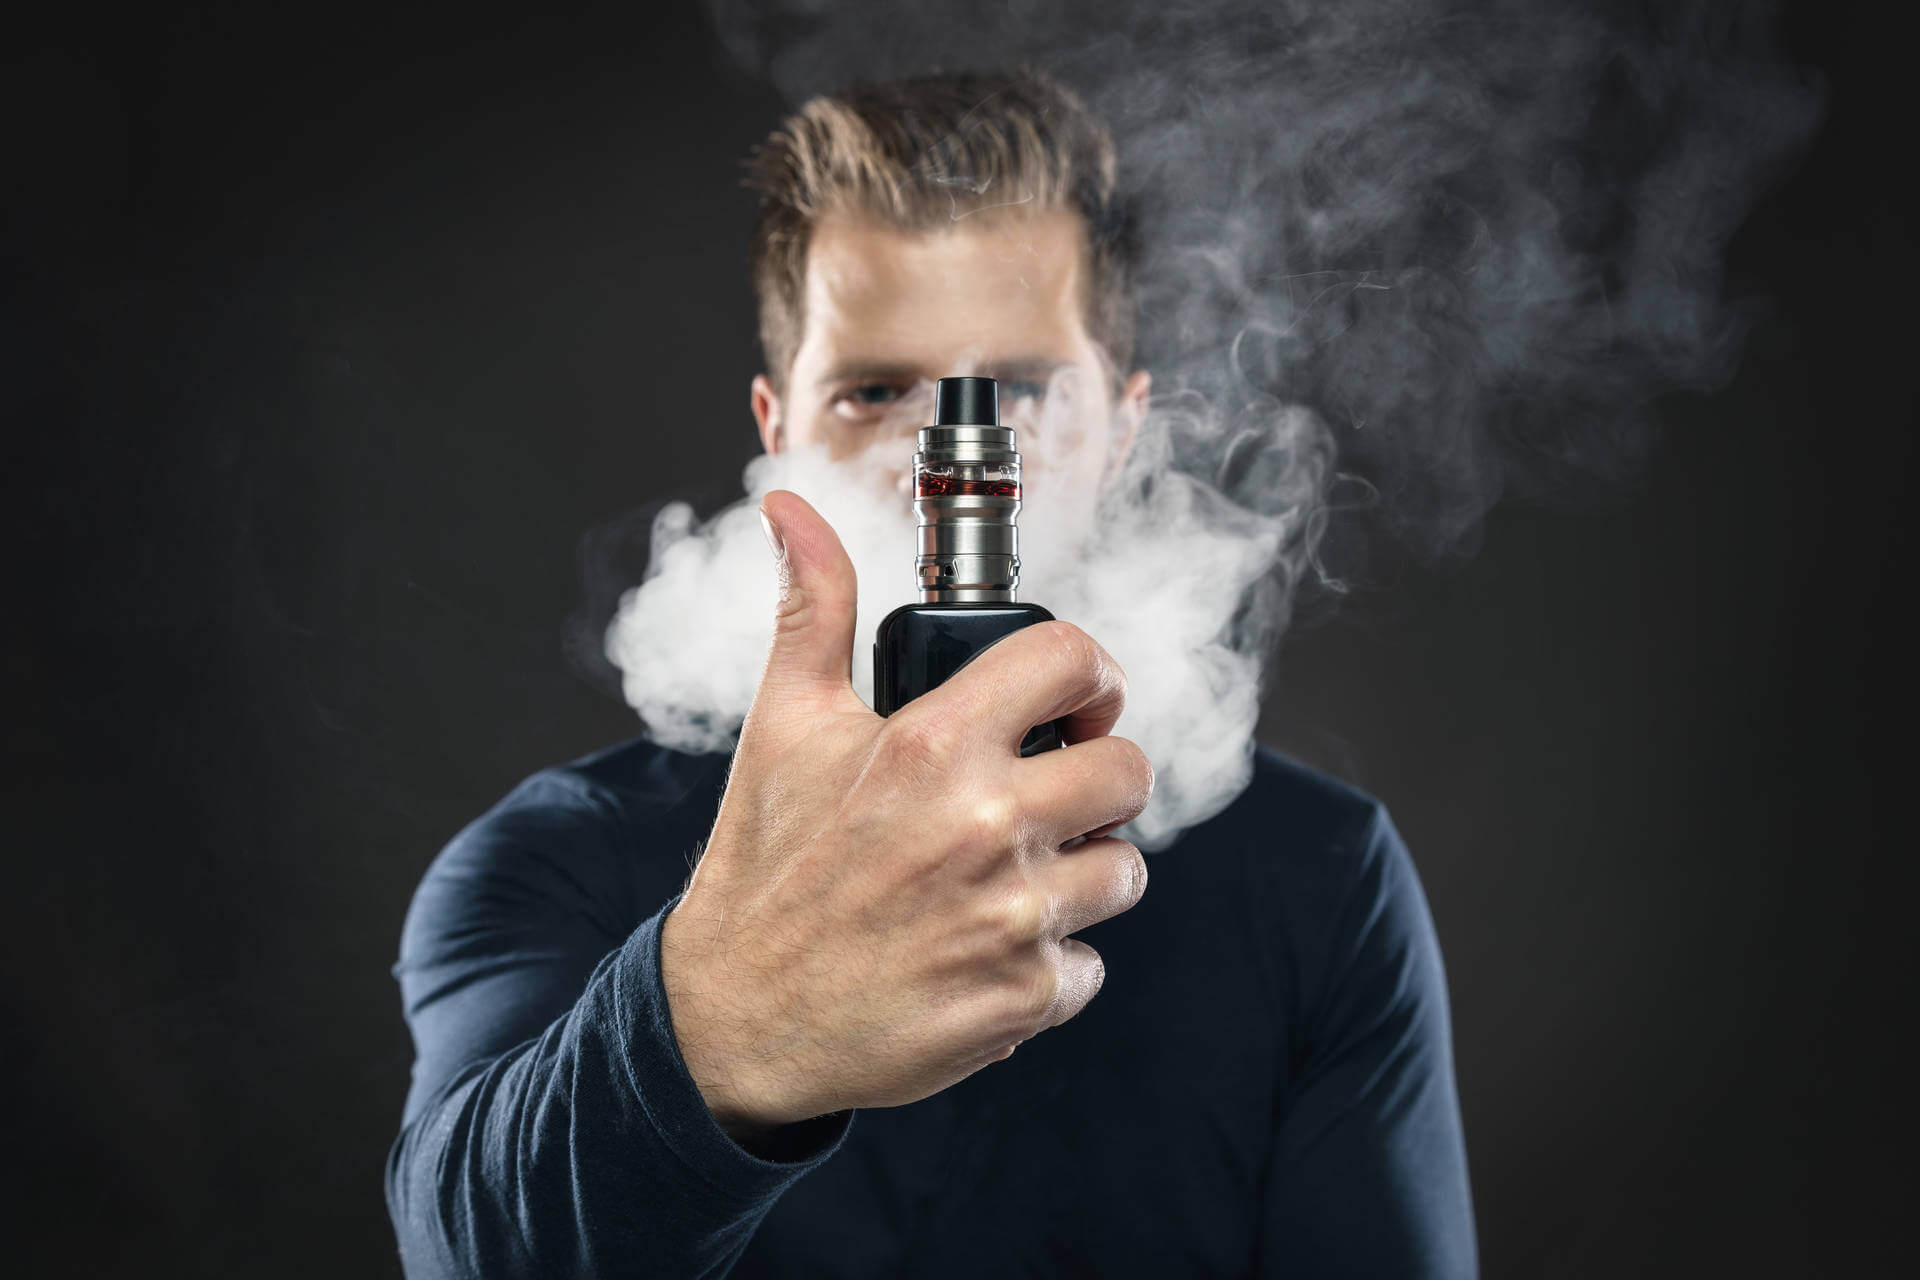 Akkusicherheit bei der E-Zigarette